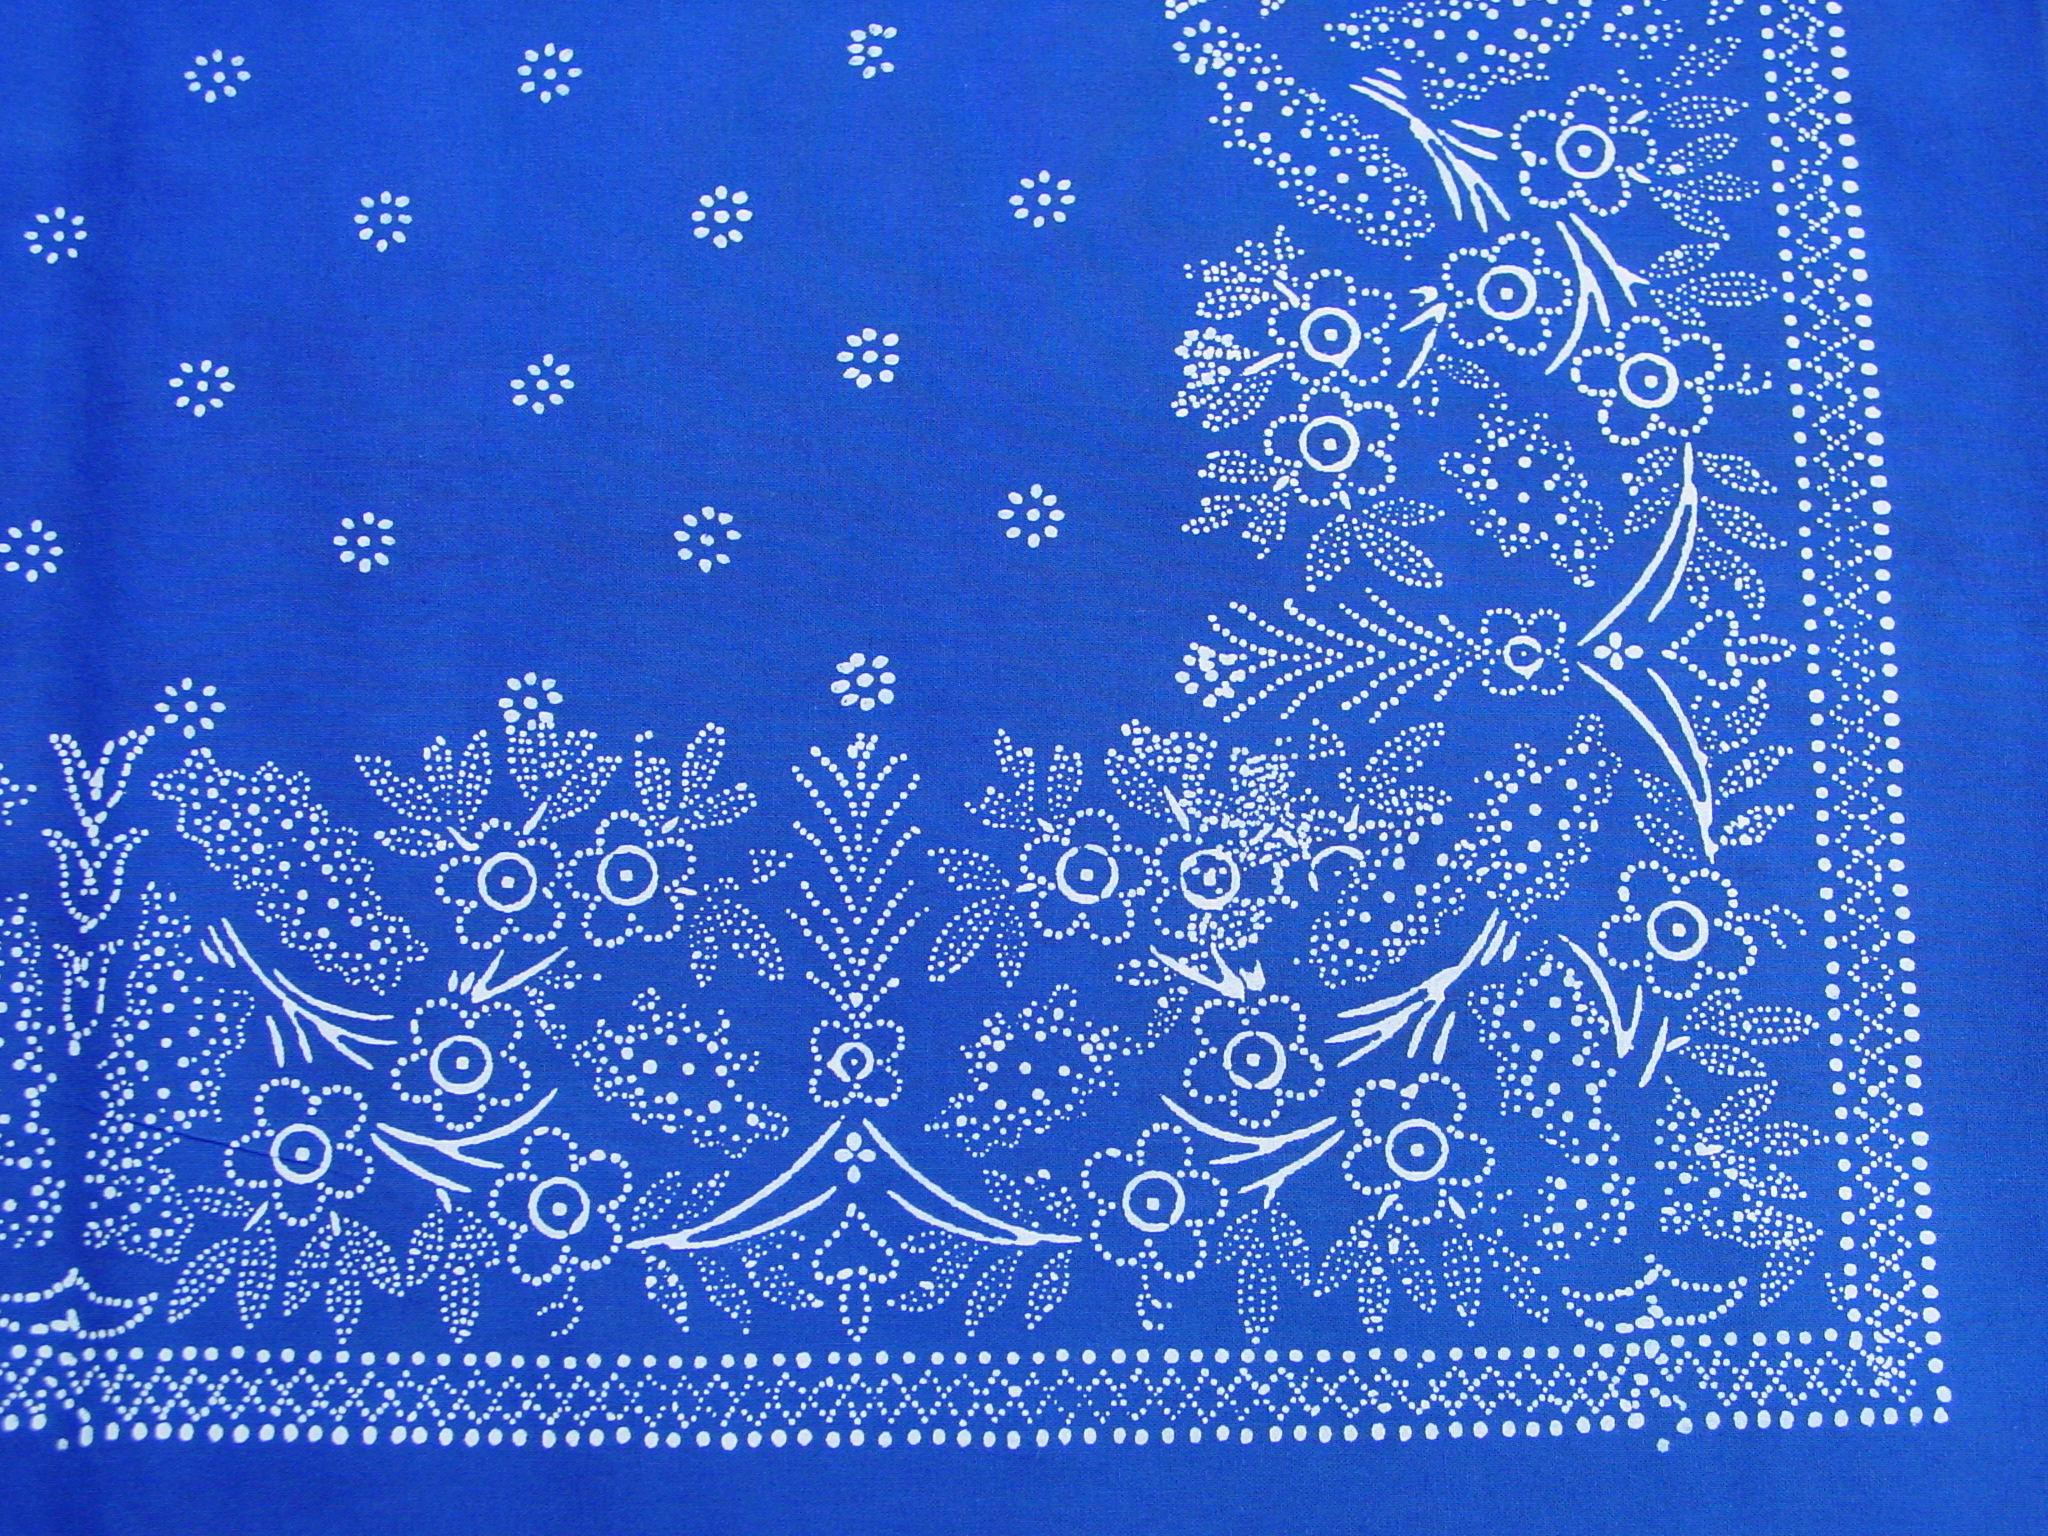 Große Blaudruck-Tischdecke 6483-1295